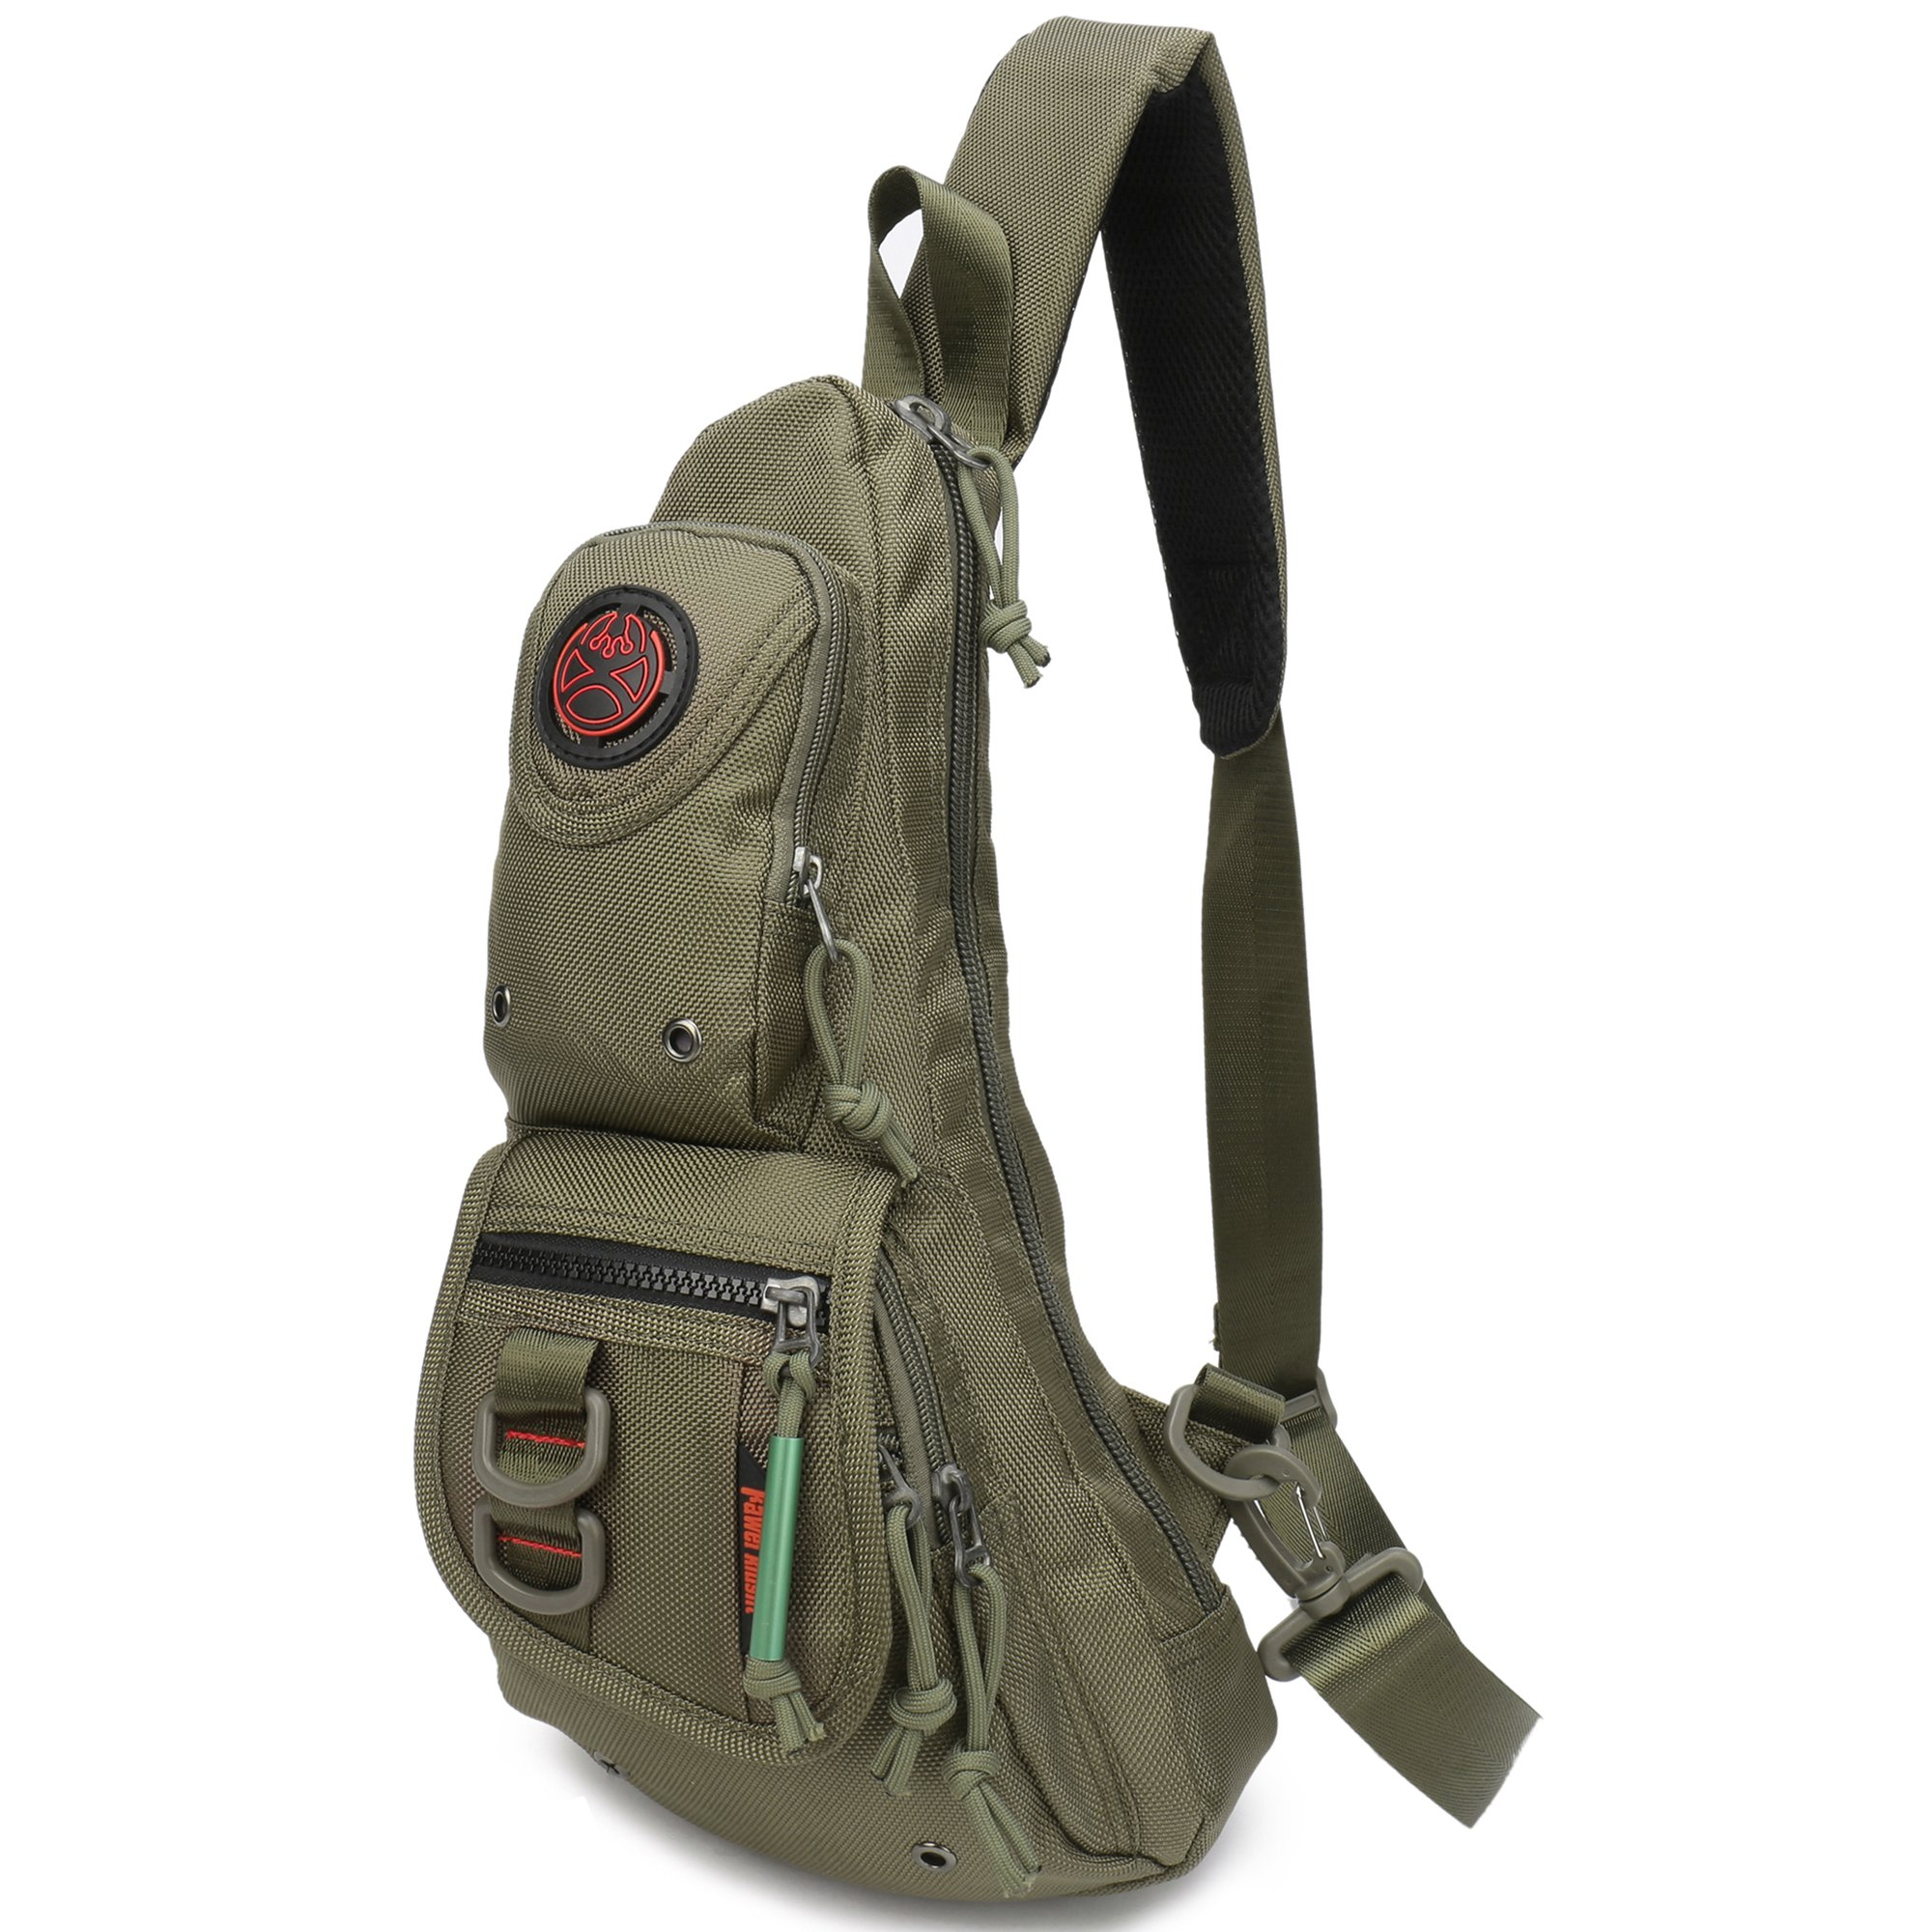 Sling Backpacks, Sling Chest Bags Shoulder Fanny Pack Crossbody Bags for Men Women Outdoor Travel Walking Dog Running (Army green)